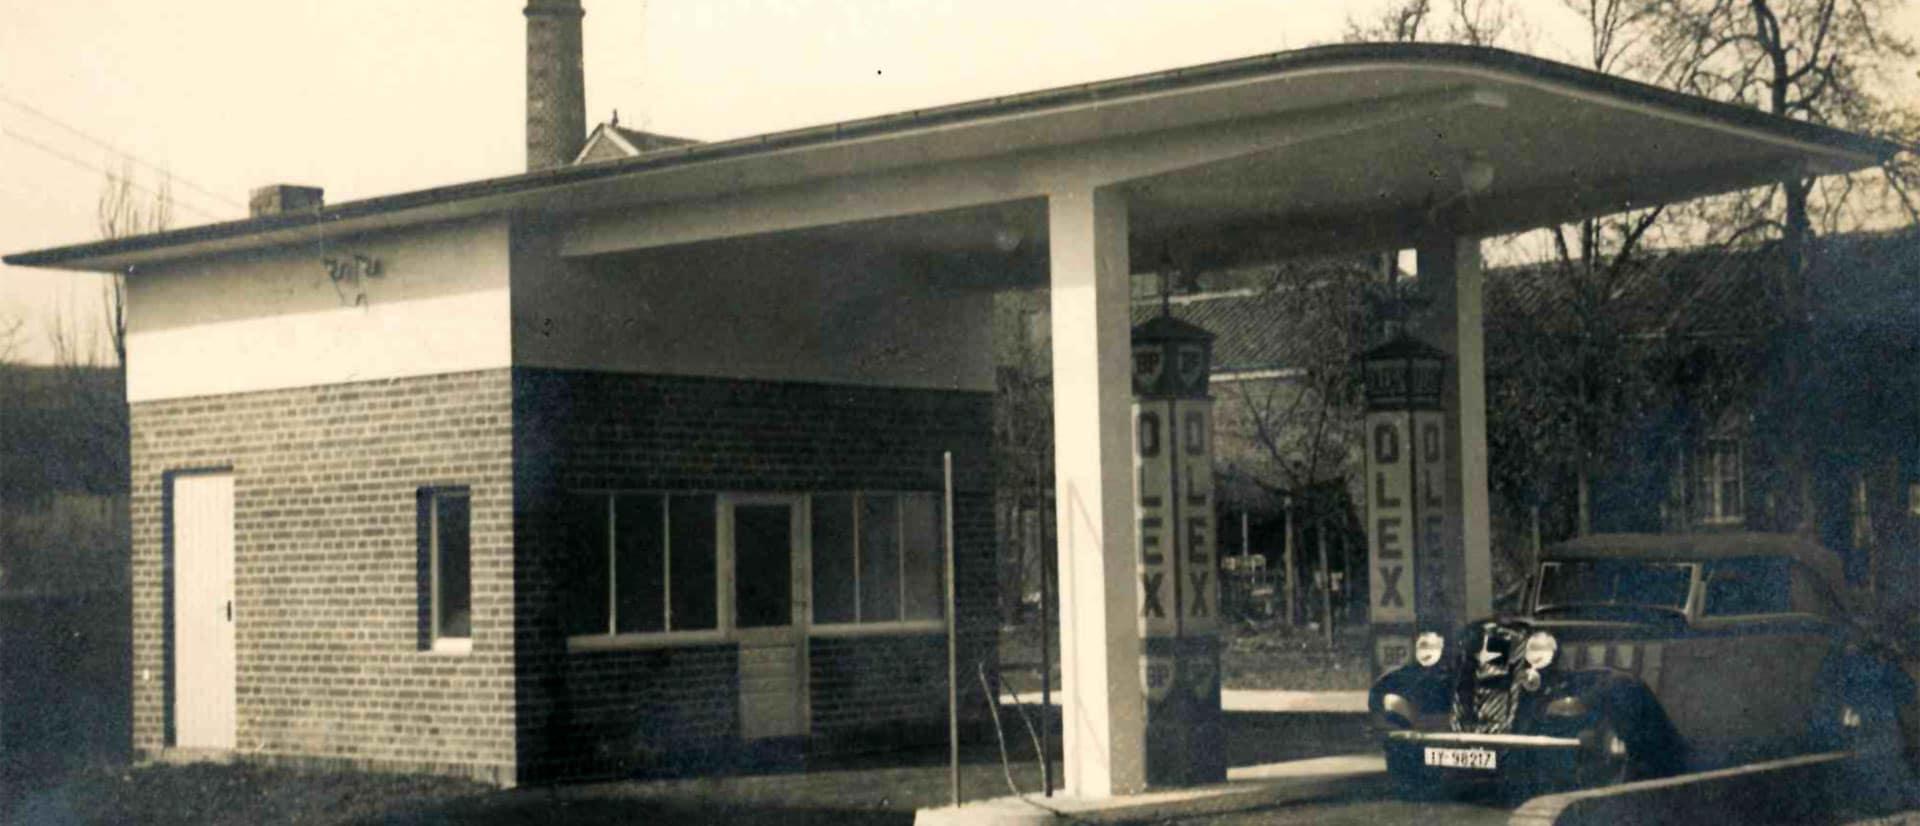 Abbildung alte Tankstelle